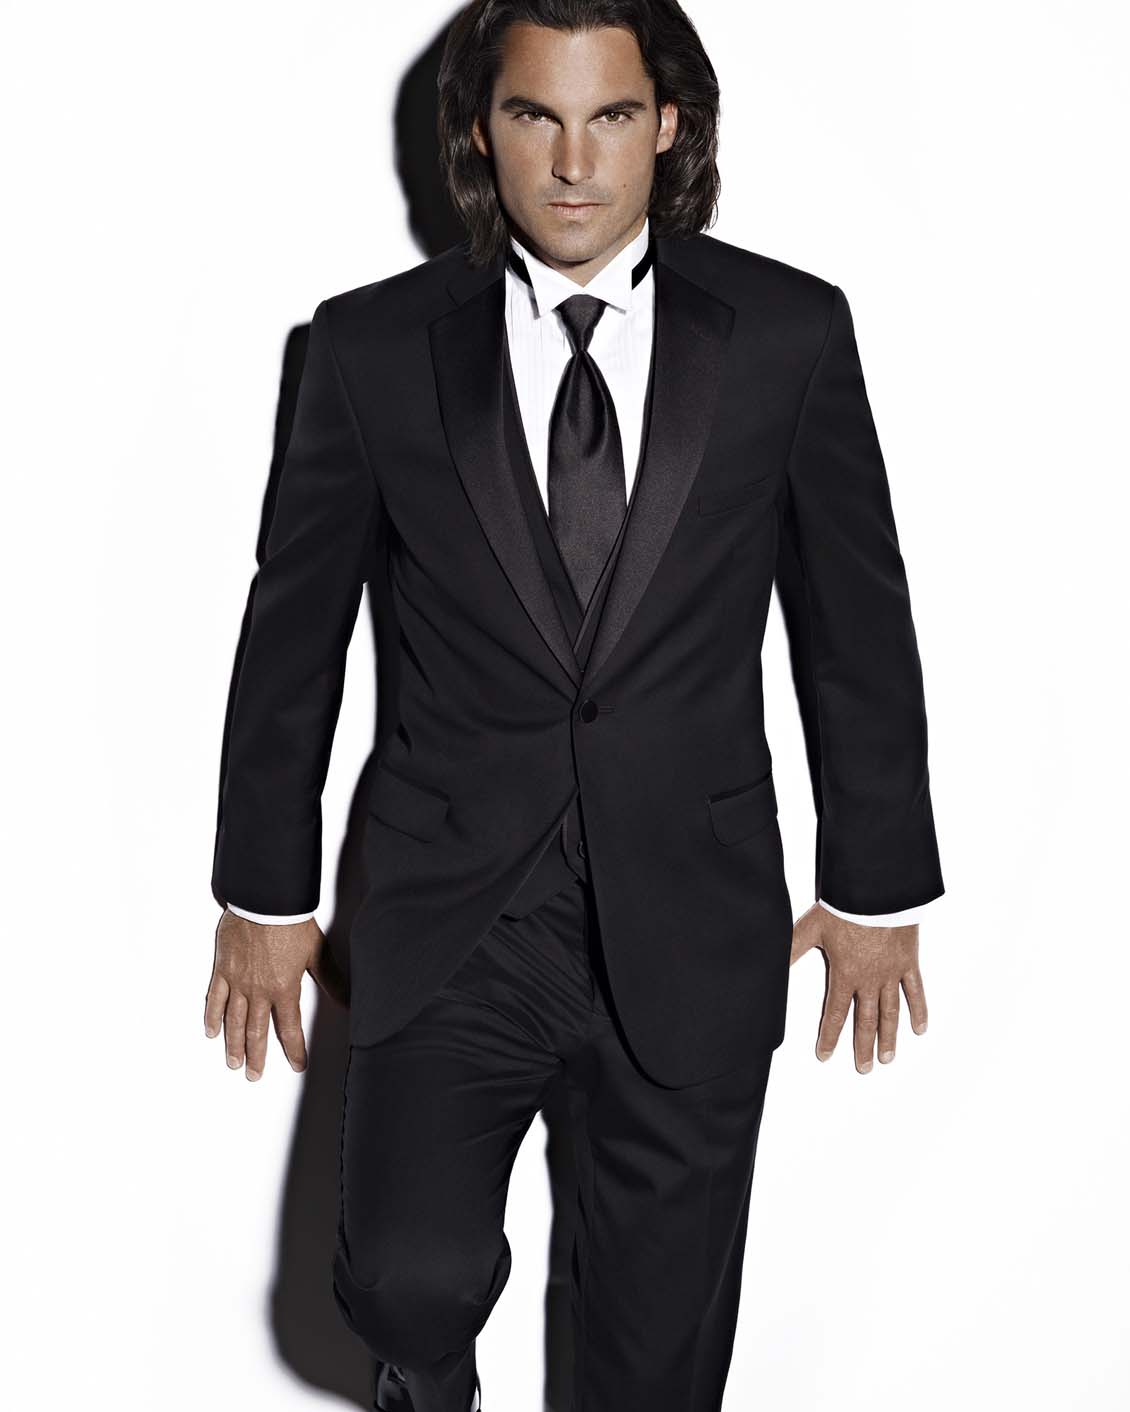 Tuxedo.ca - JEAN YVES MODERN ESSENTIAL BLACK TUXEDO